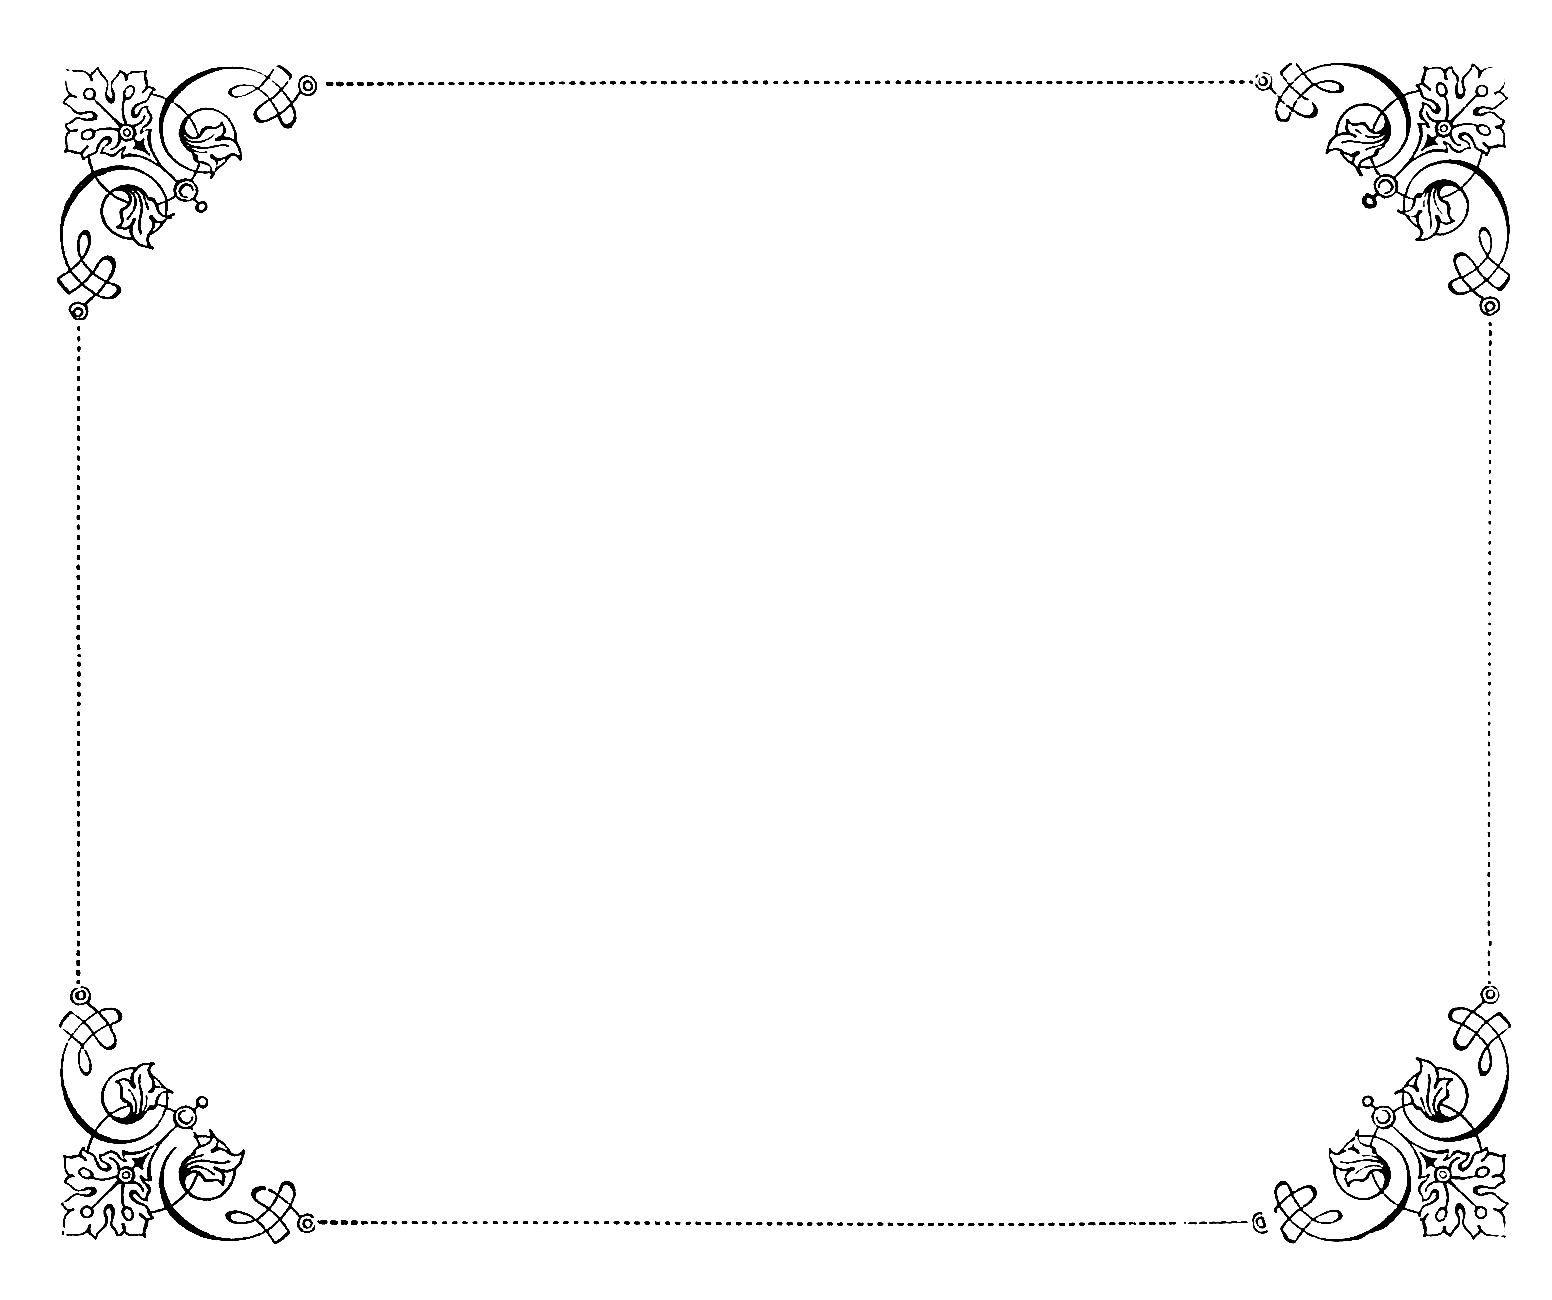 8 Fancy Paper Border Designs Images.